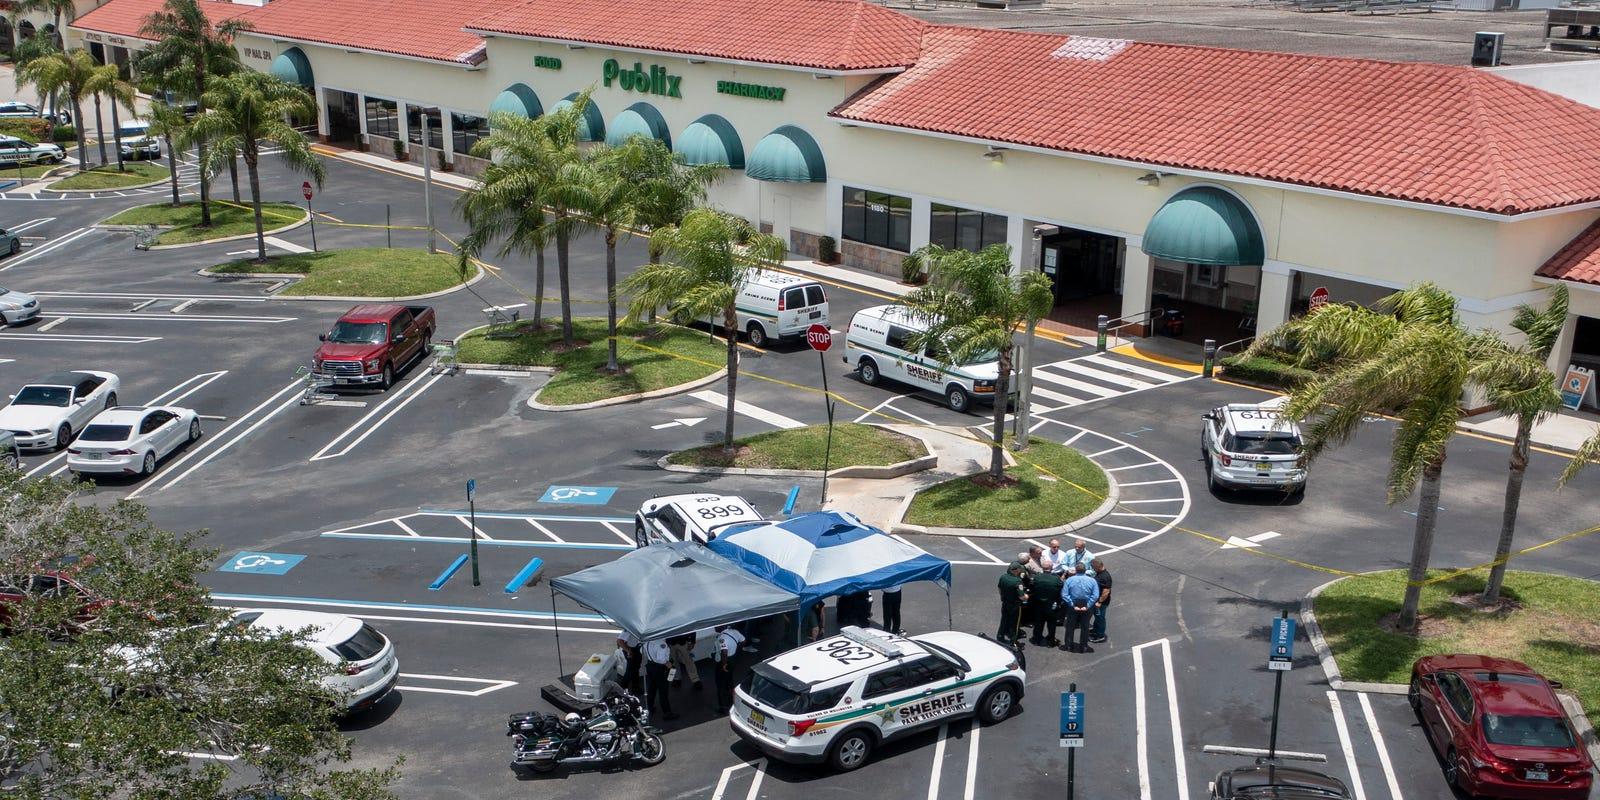 'They're shooting!': Gunman kills grandmother, toddler then self inside Royal Palm Publix - Palm Beach Post